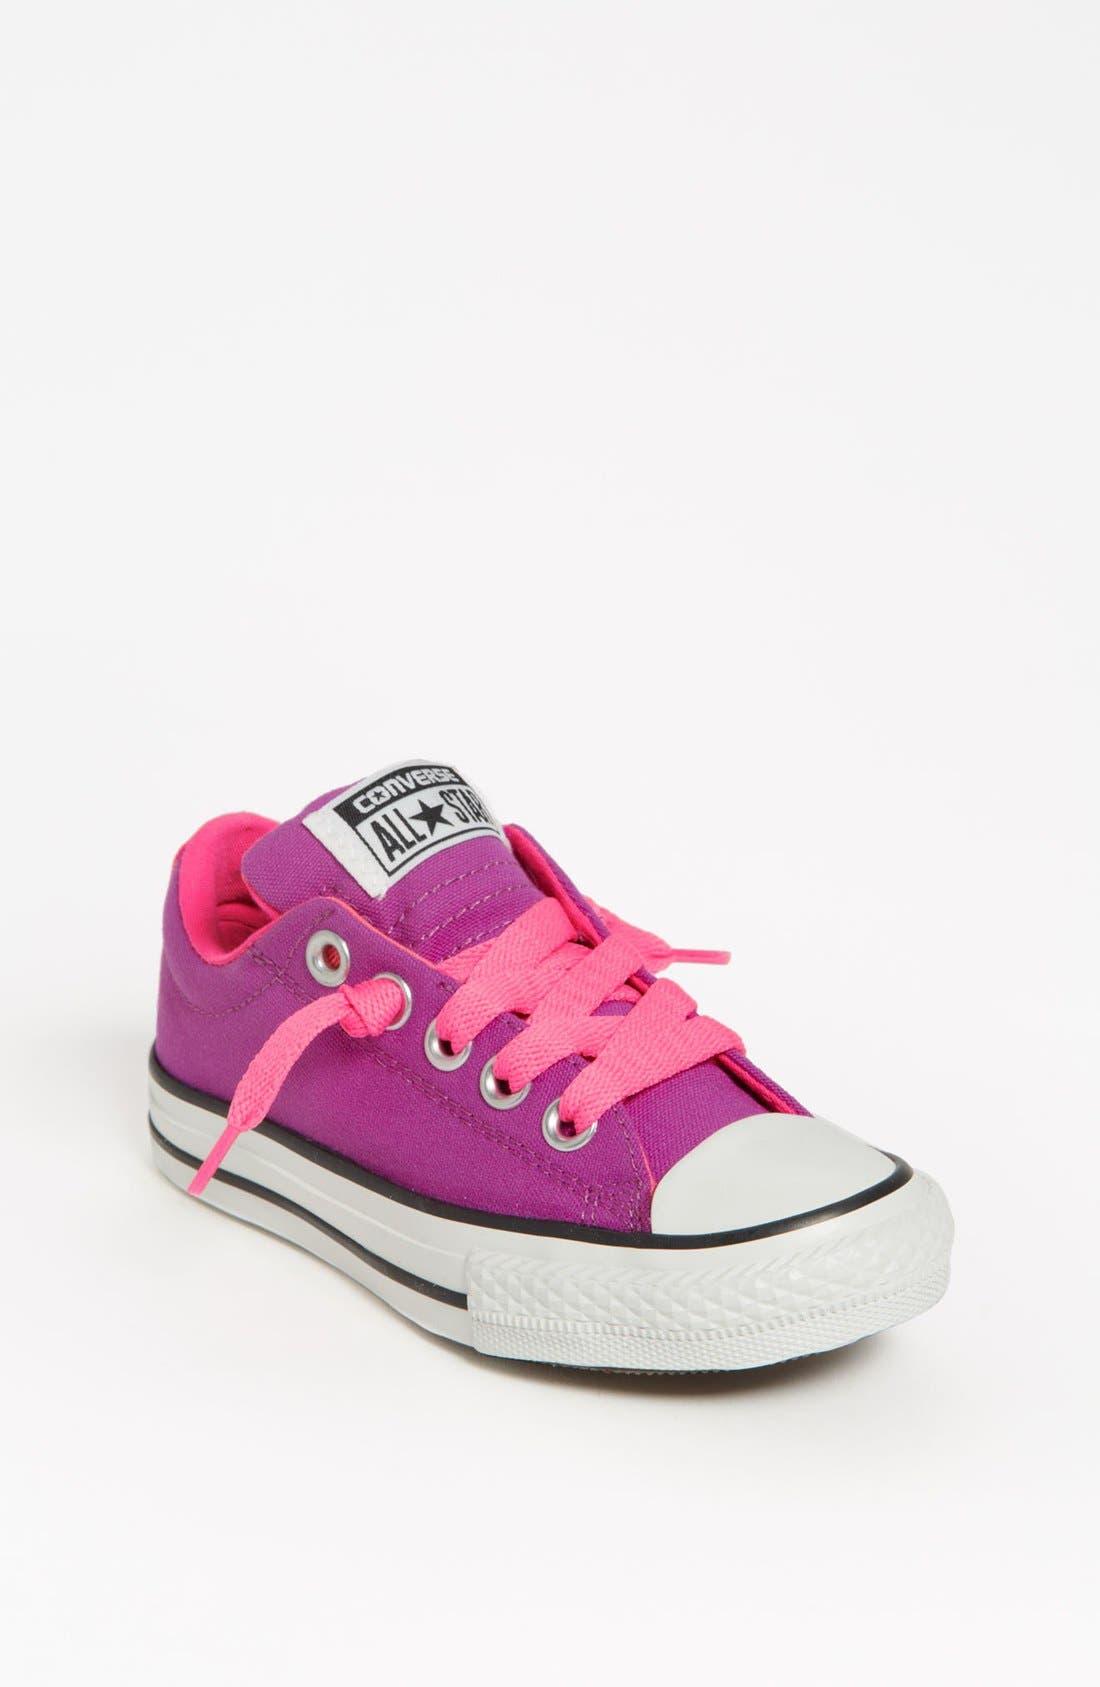 Alternate Image 1 Selected - Converse Chuck Taylor® All Star® 'Neon Street' Sneaker (Toddler, Little Kid & Big Kid)